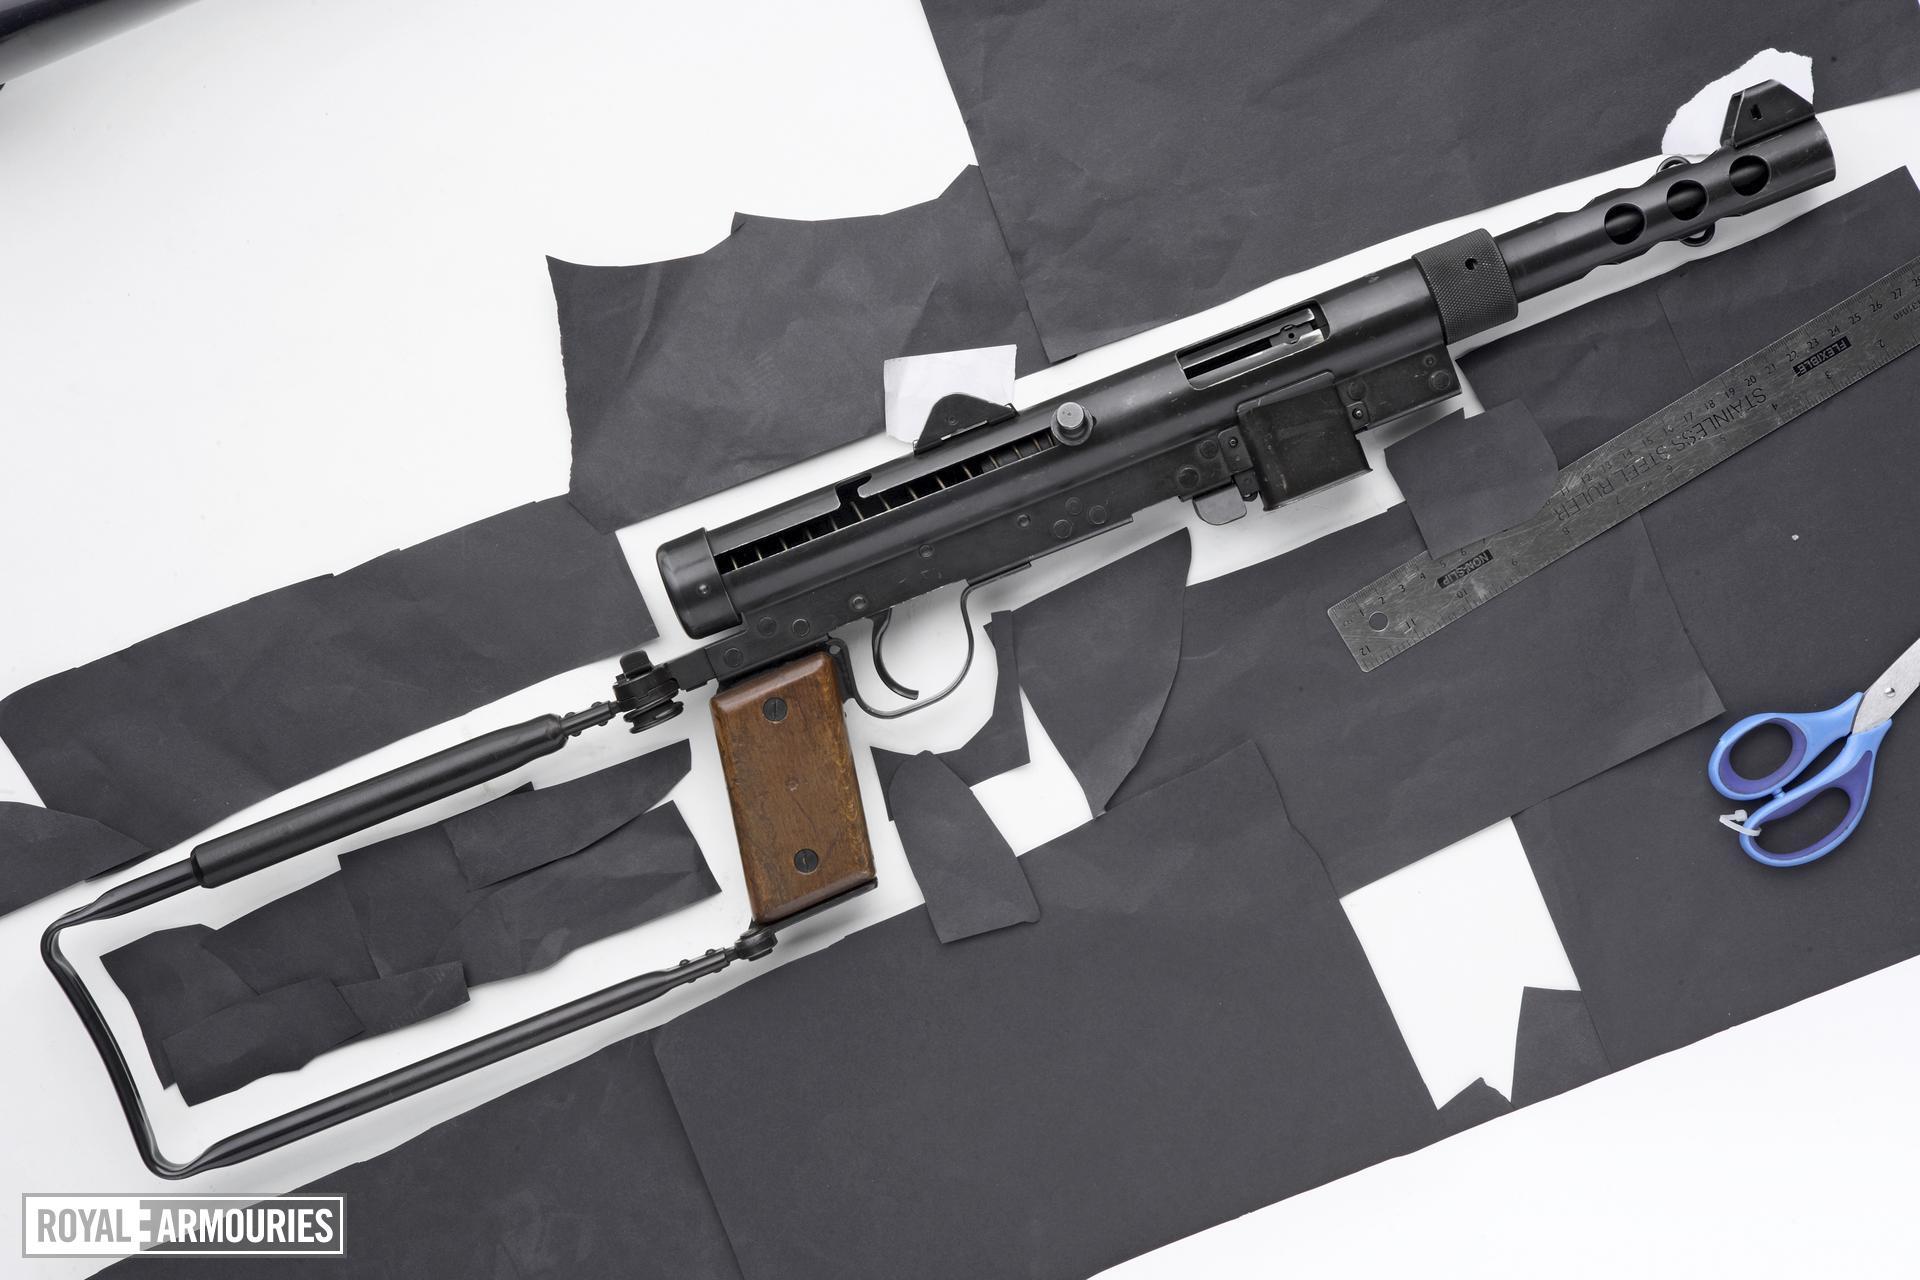 Centrefire automatic submachine gun - Carl Gustav M/45B